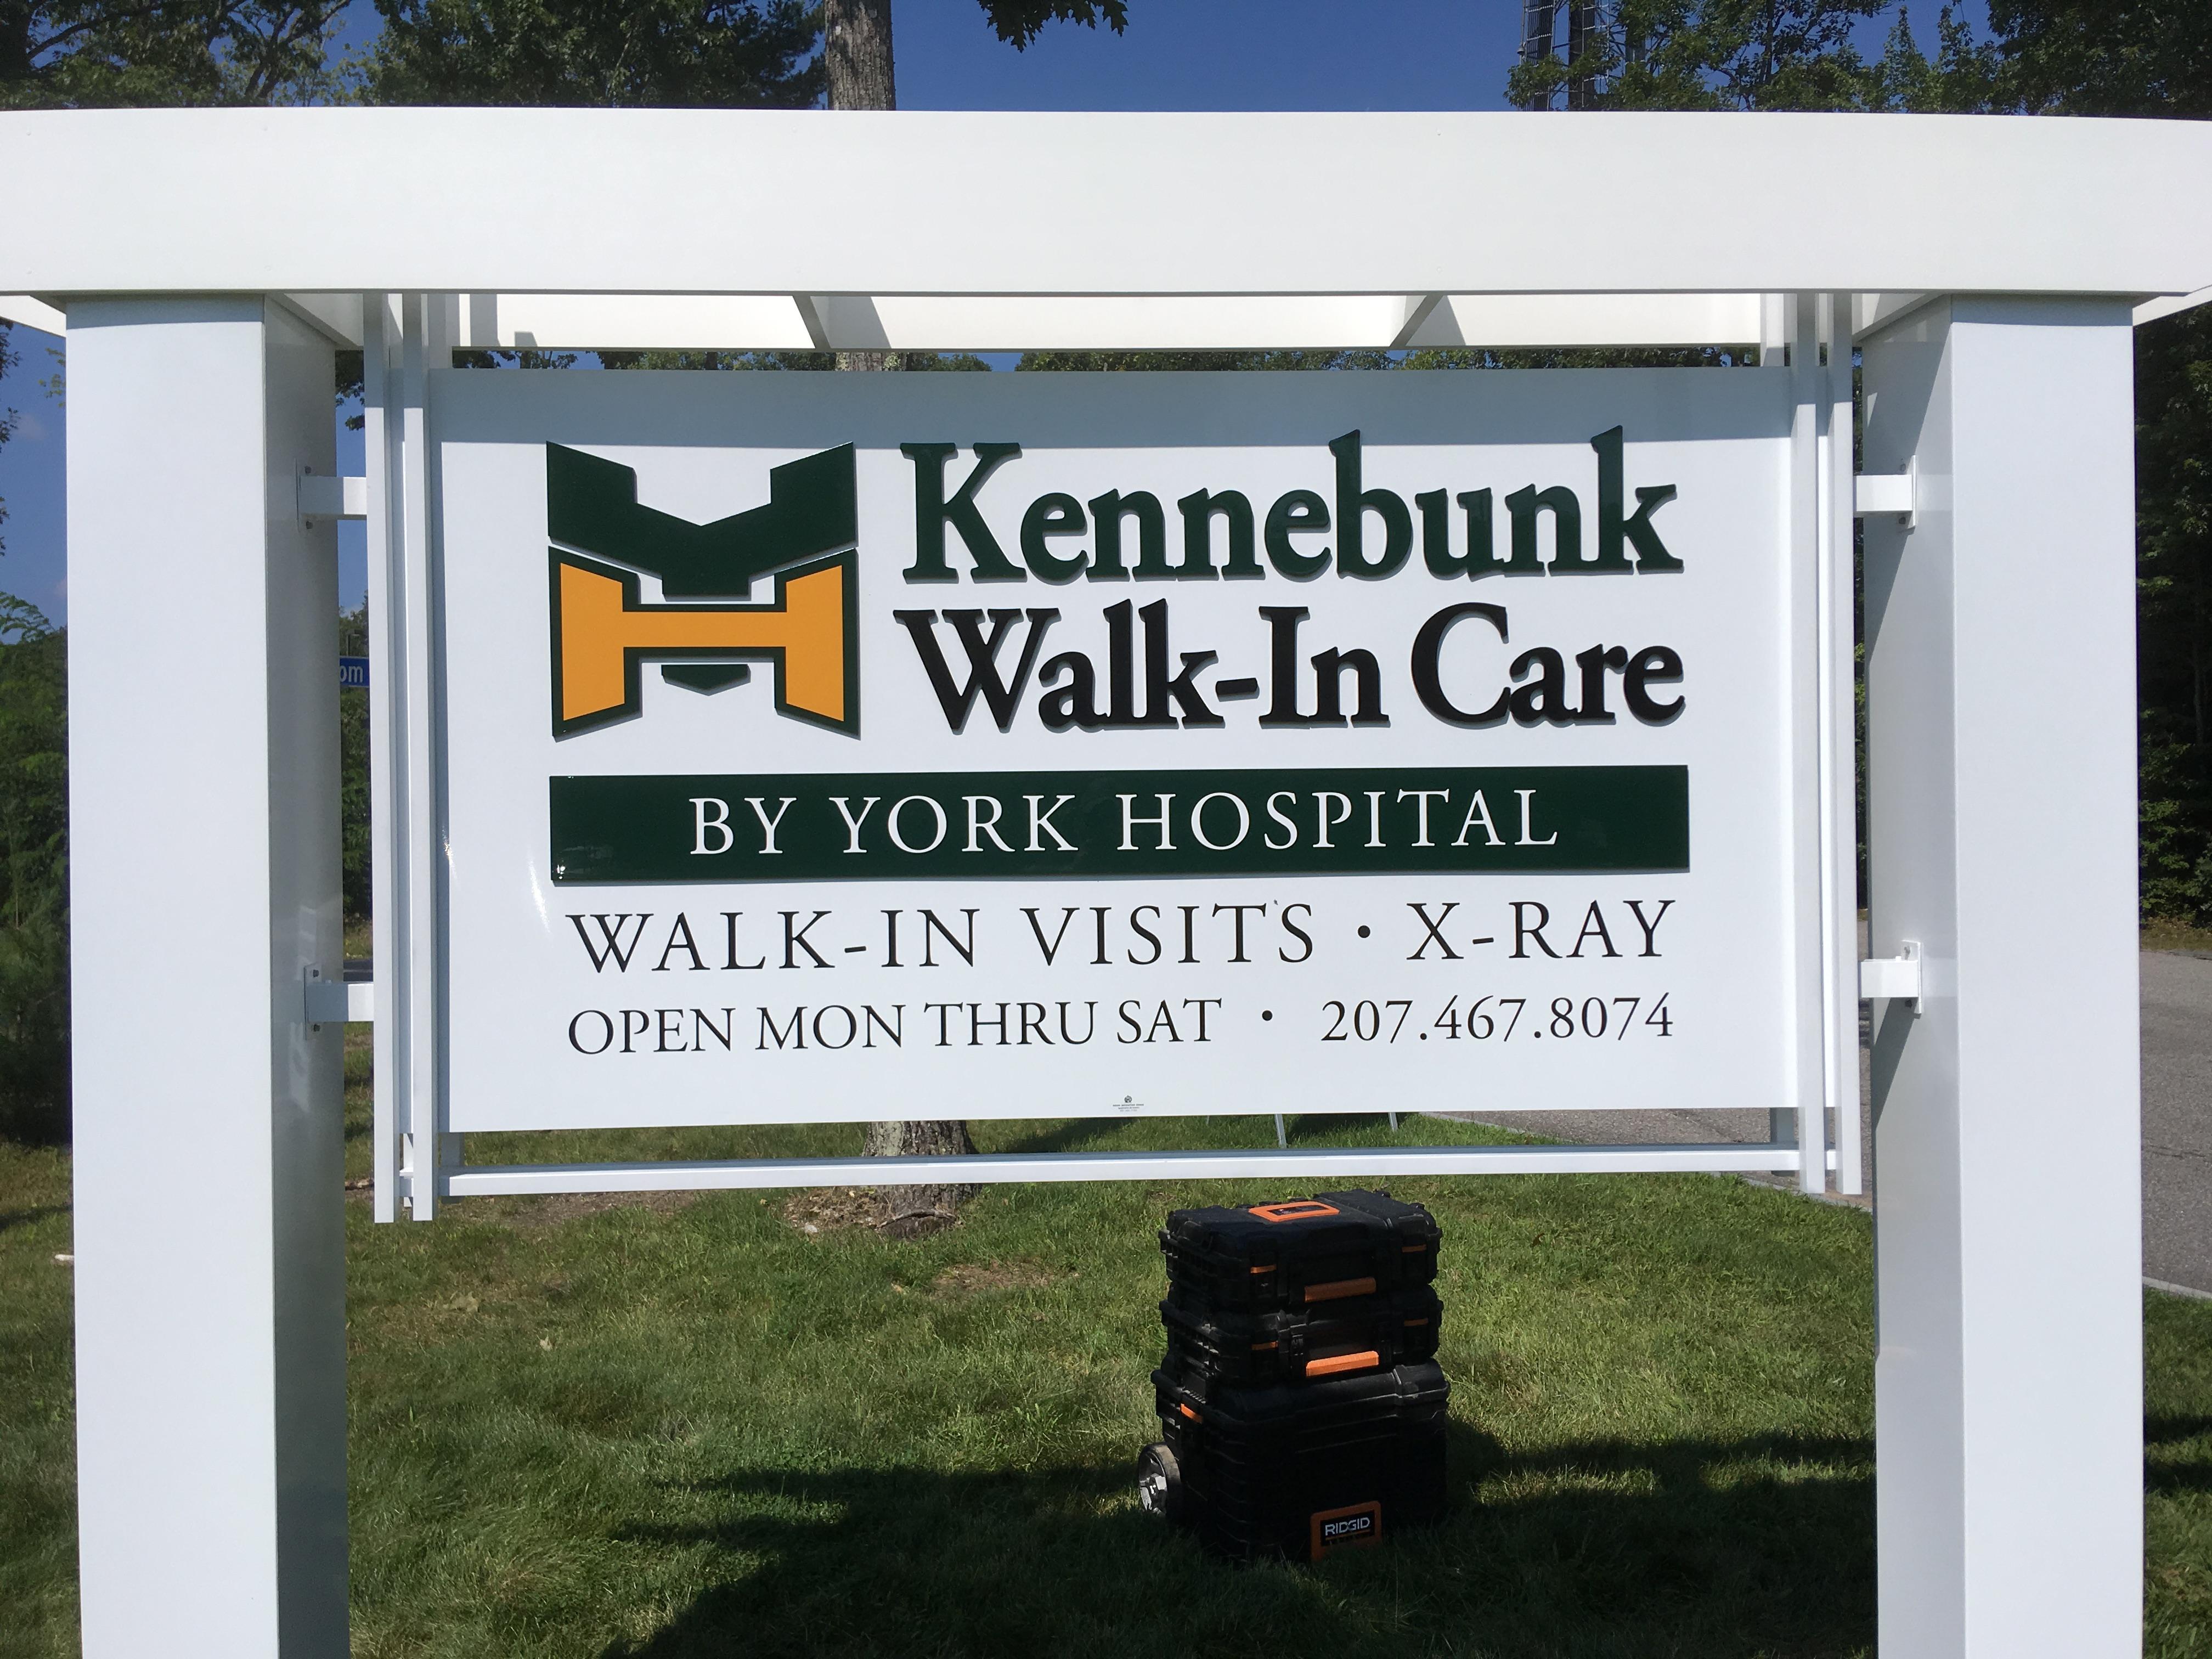 Kennebunk Walk-In Care